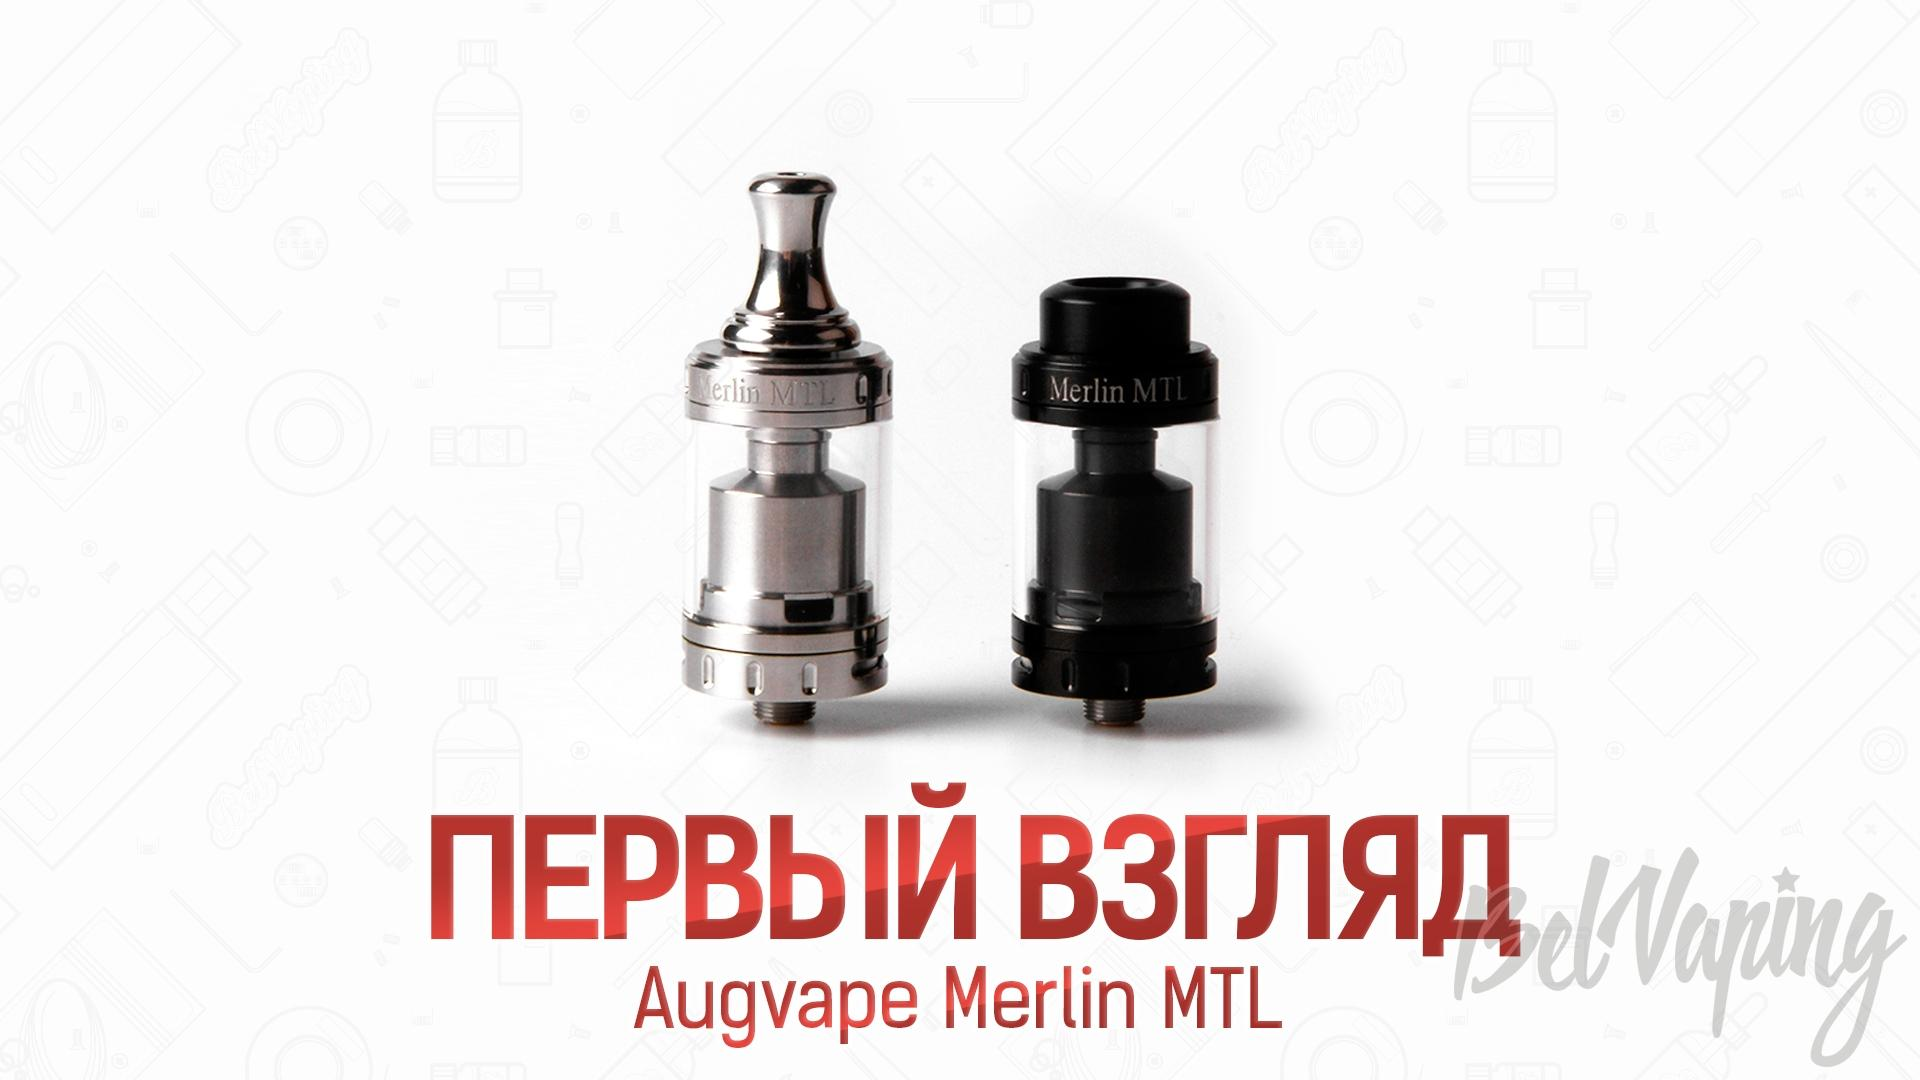 Augvape Merlin MTL. Первый взгляд